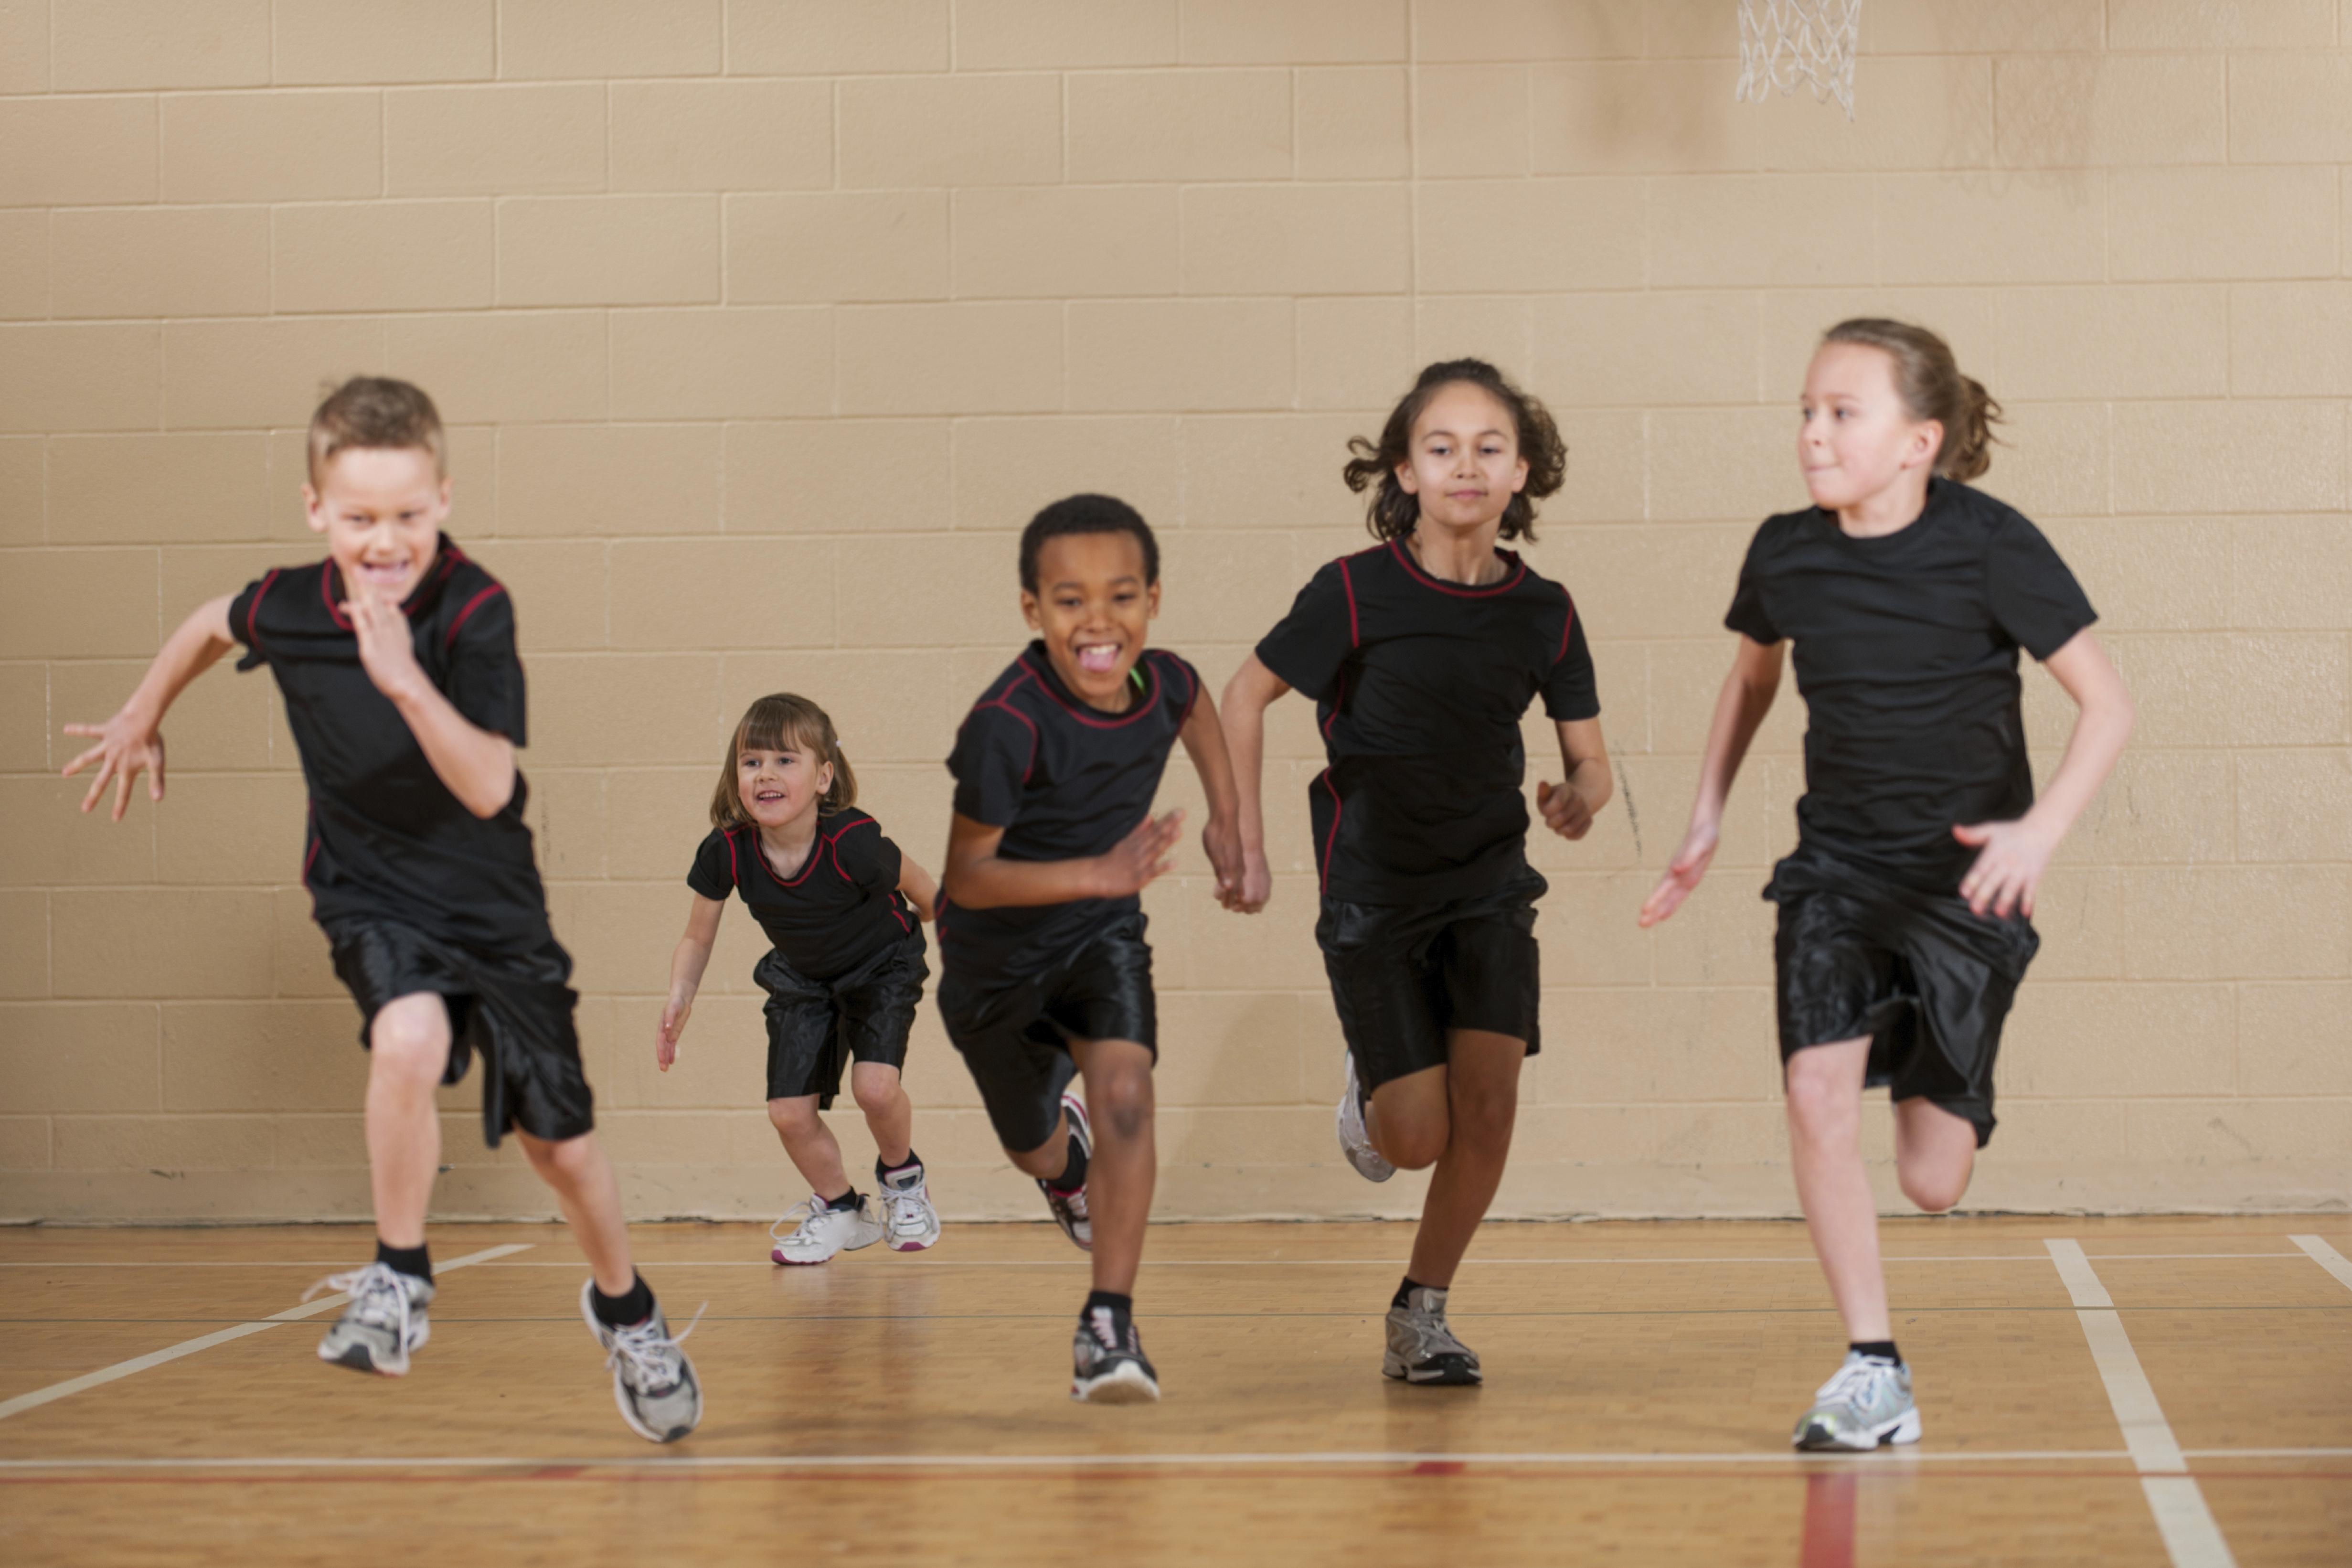 lifelong benefits of childhood sports essay